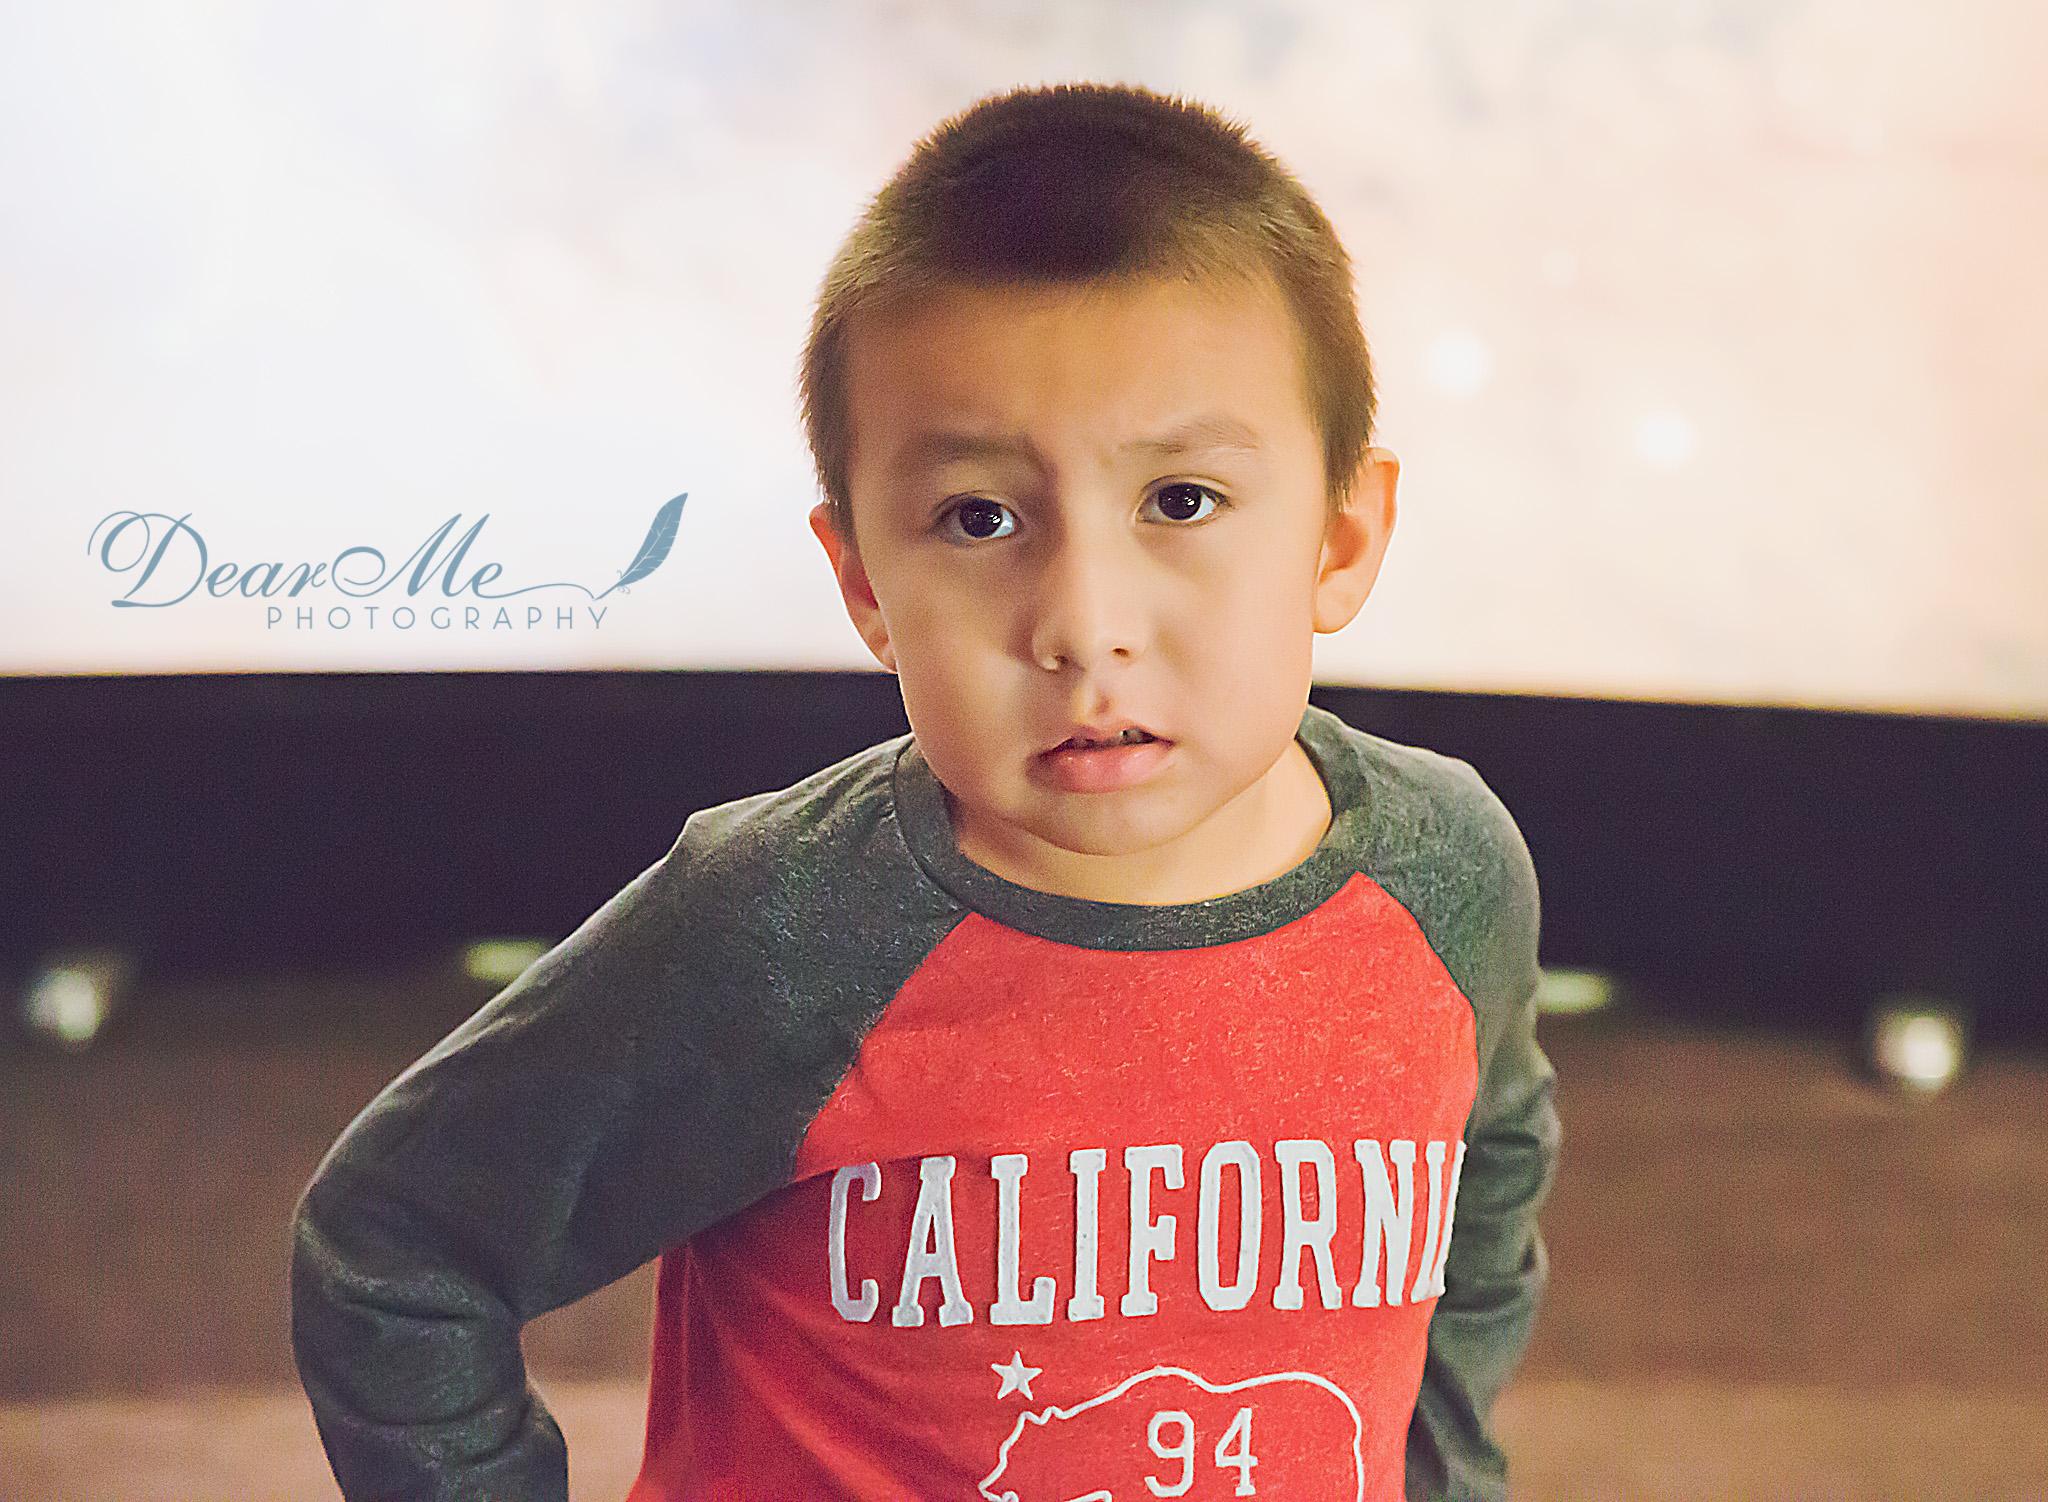 dear me photography bismarck photographer boy in california shirt